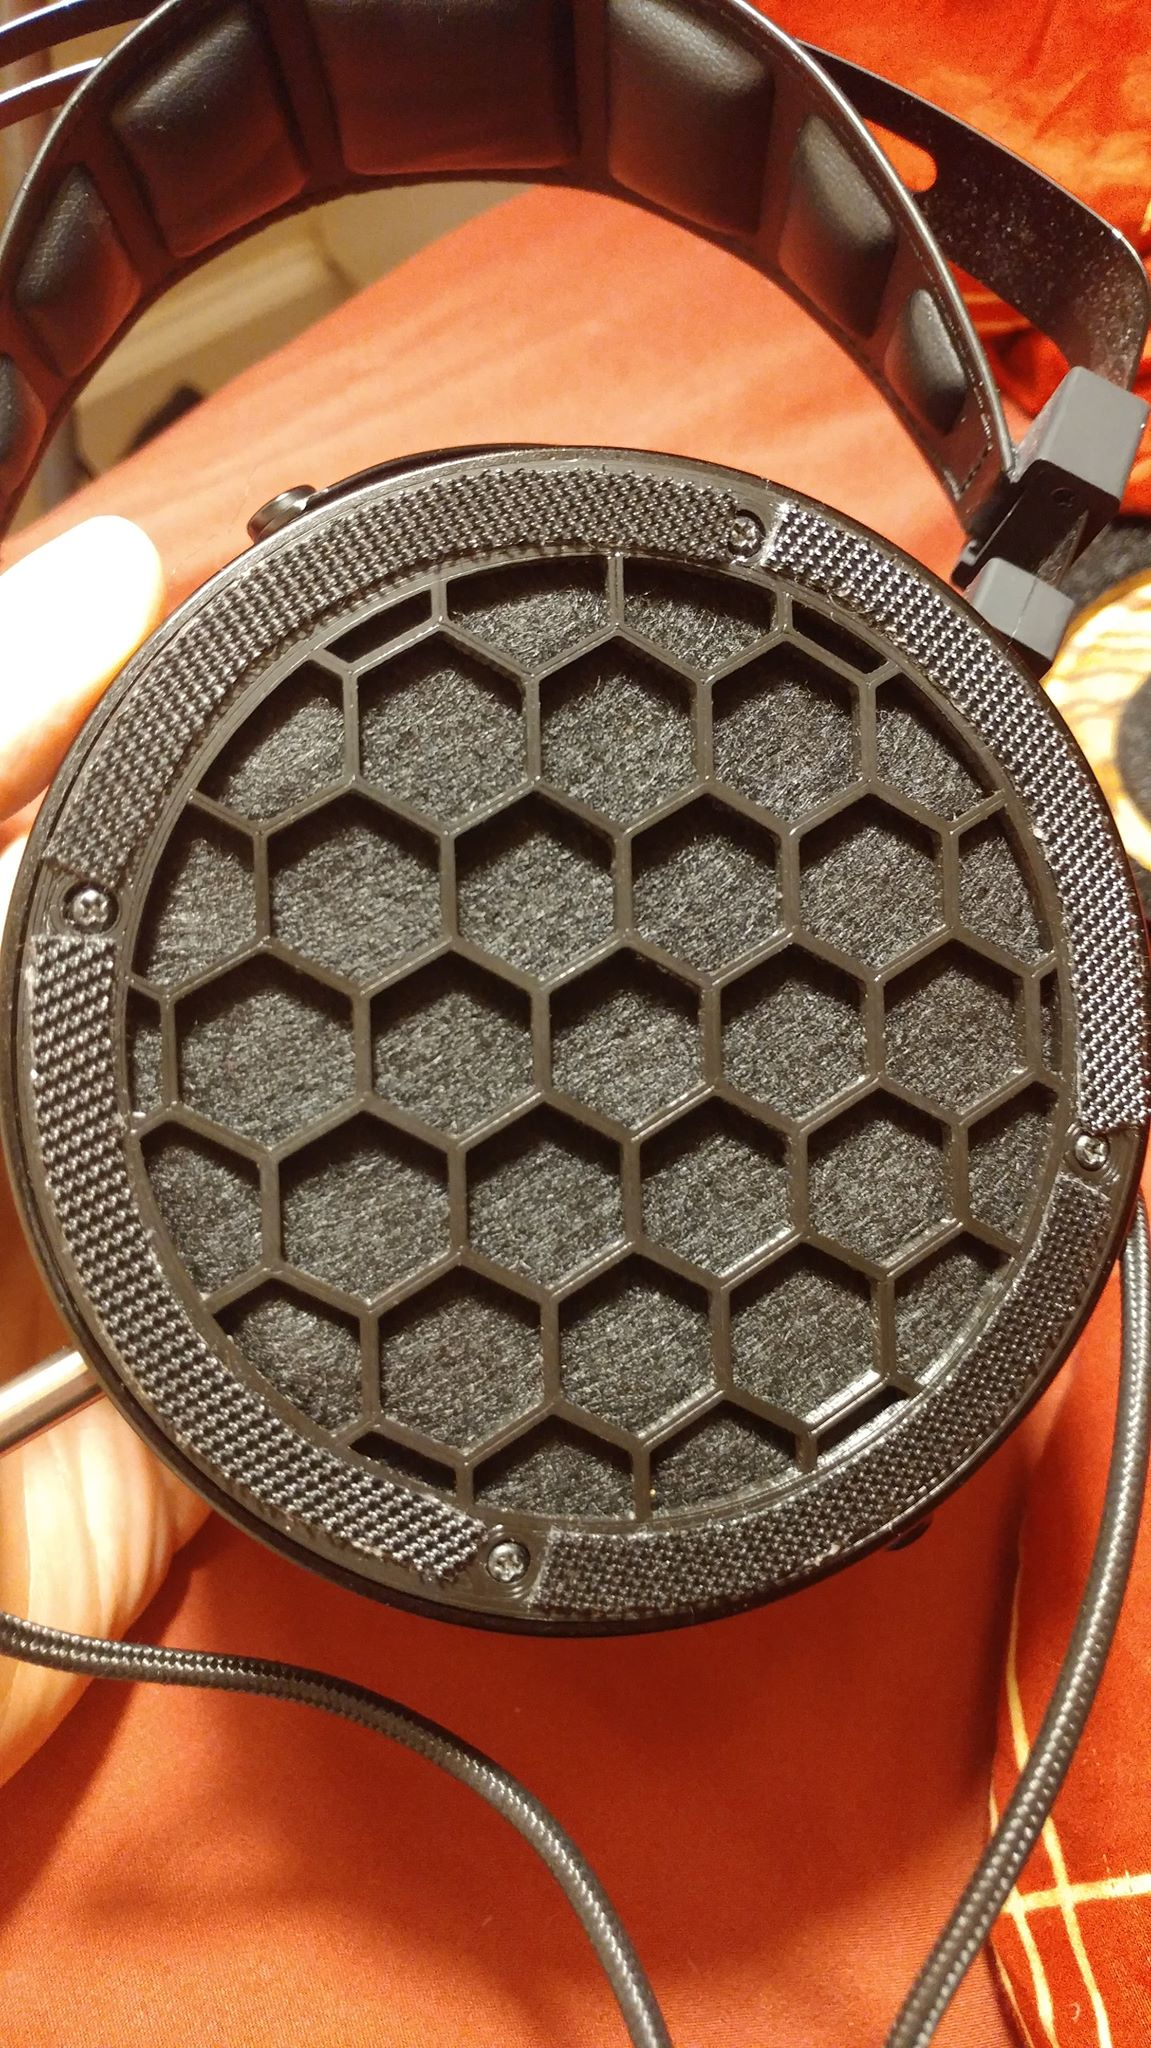 Monolith M1060C Closed Back Planar Headphones impressions | Page 39